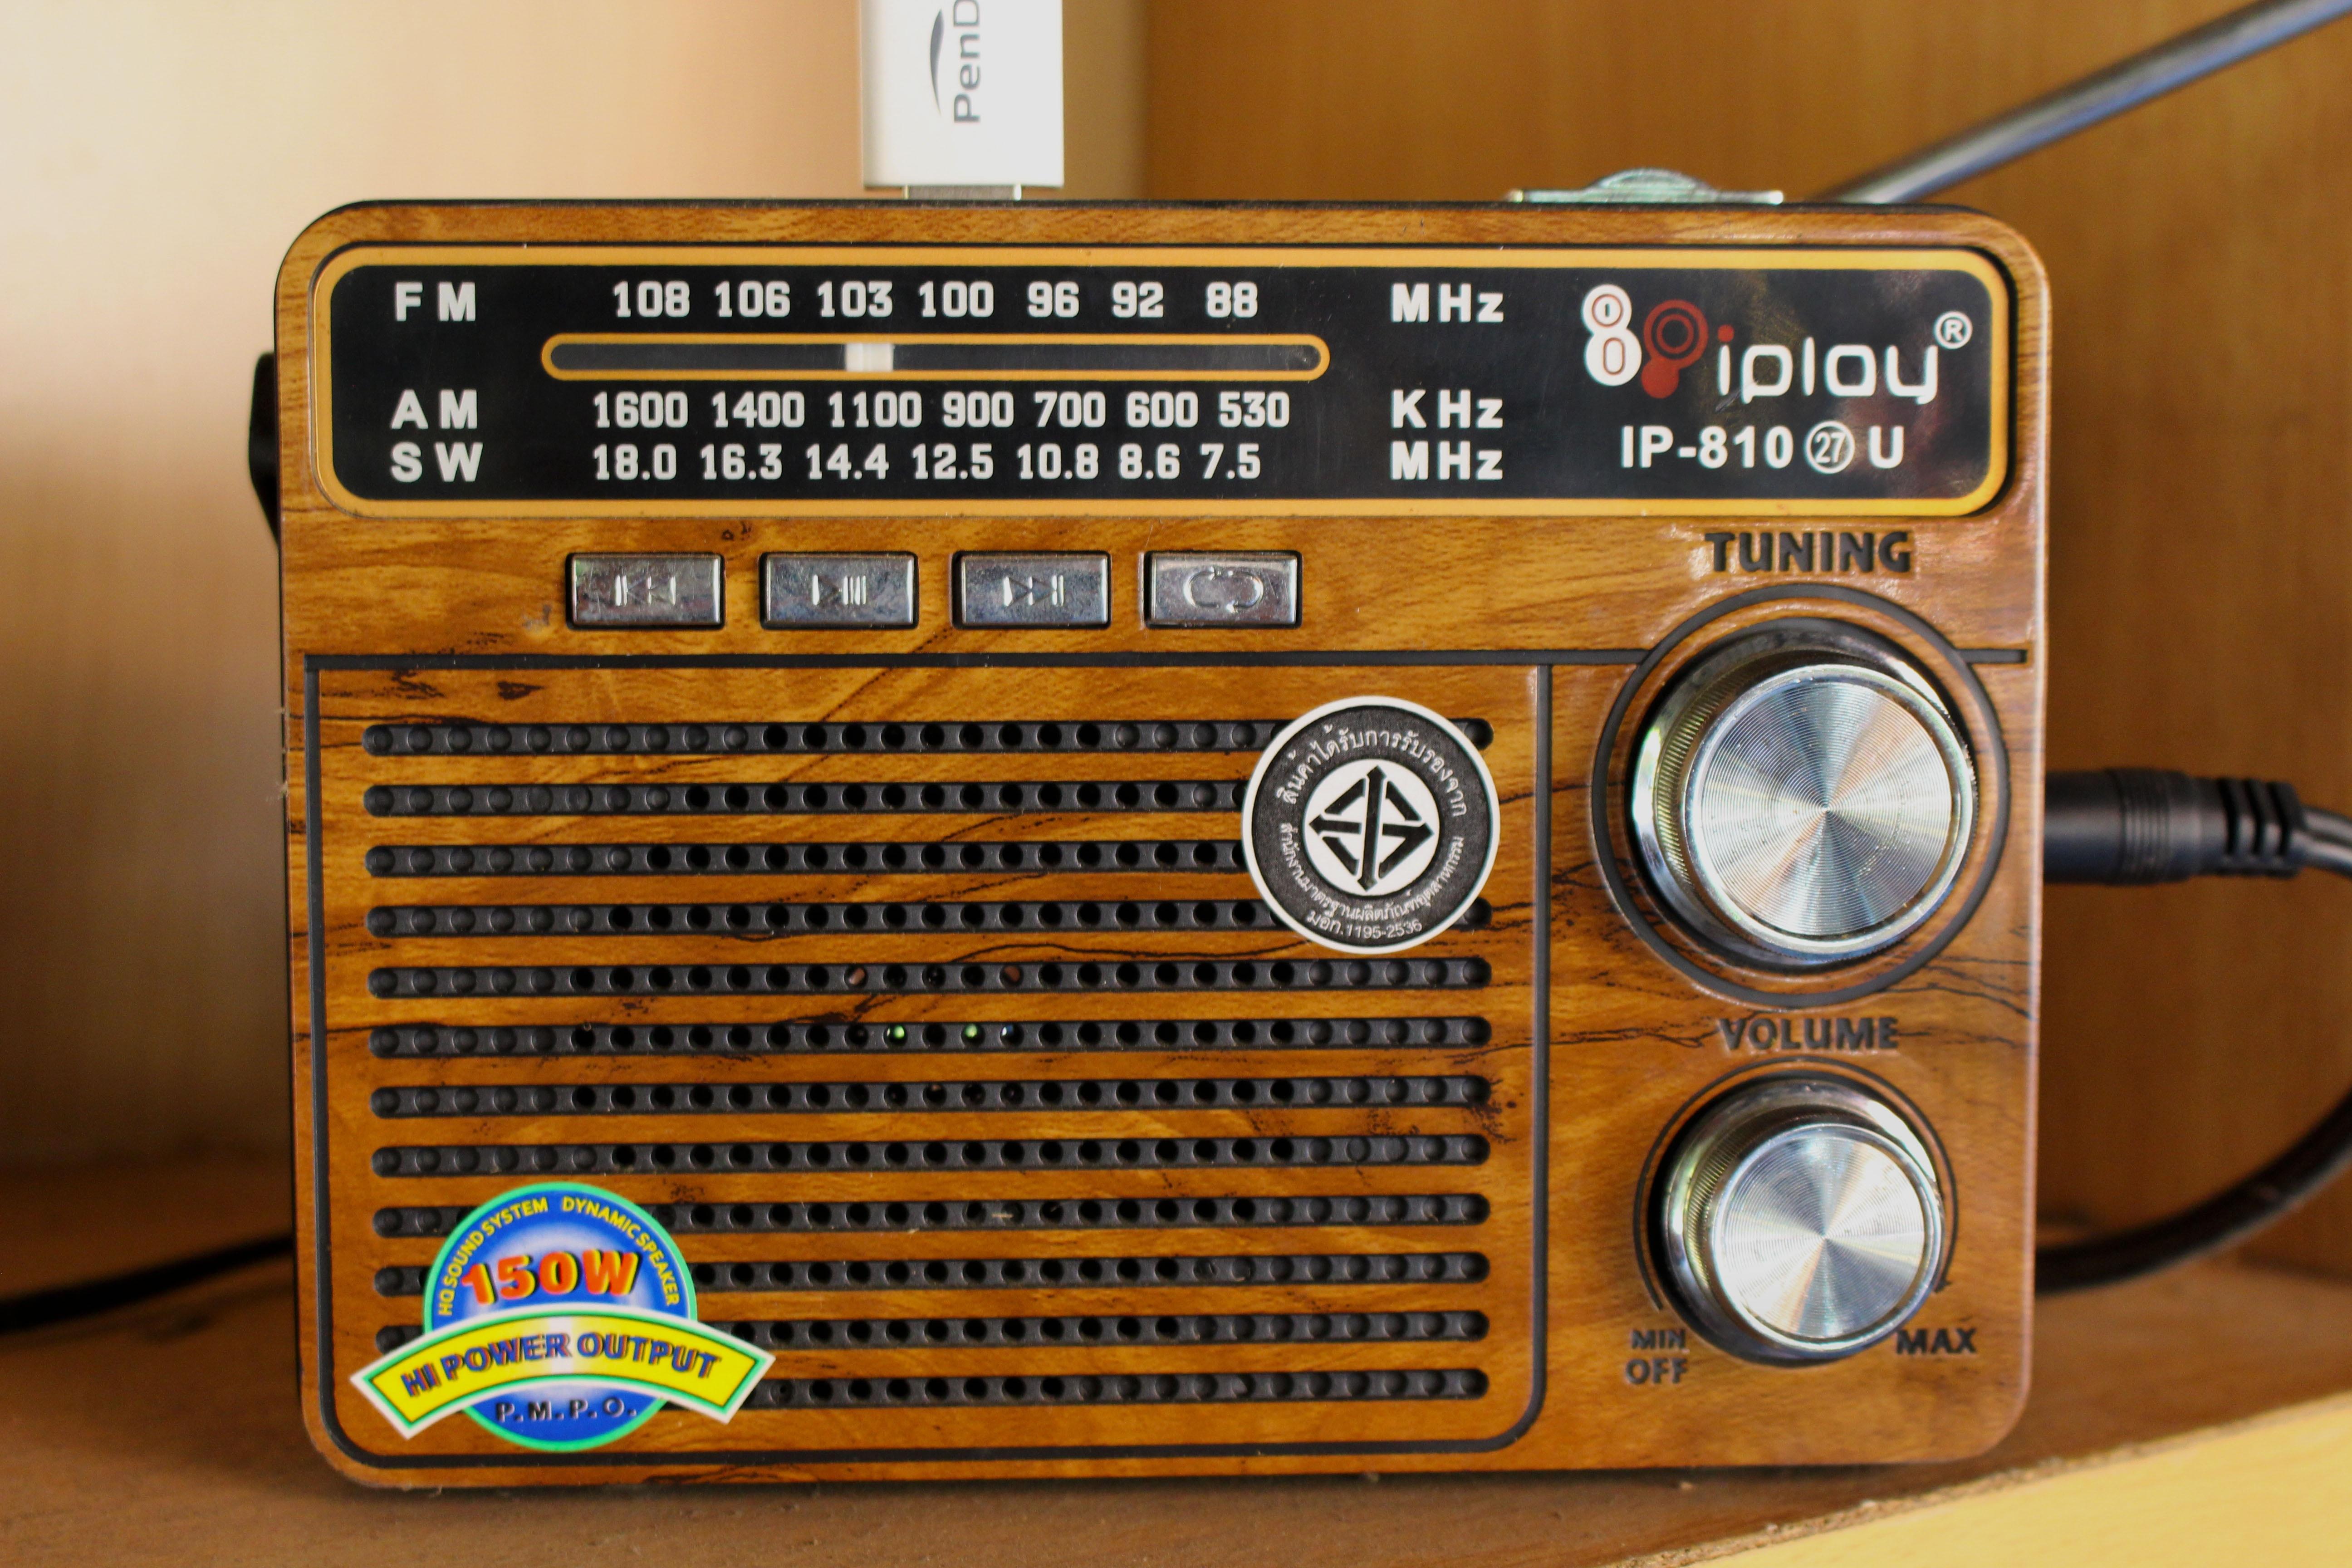 music technology equipment munication signal speaker radio broadcast electronics audio media sound broadcasting icon network multimedia